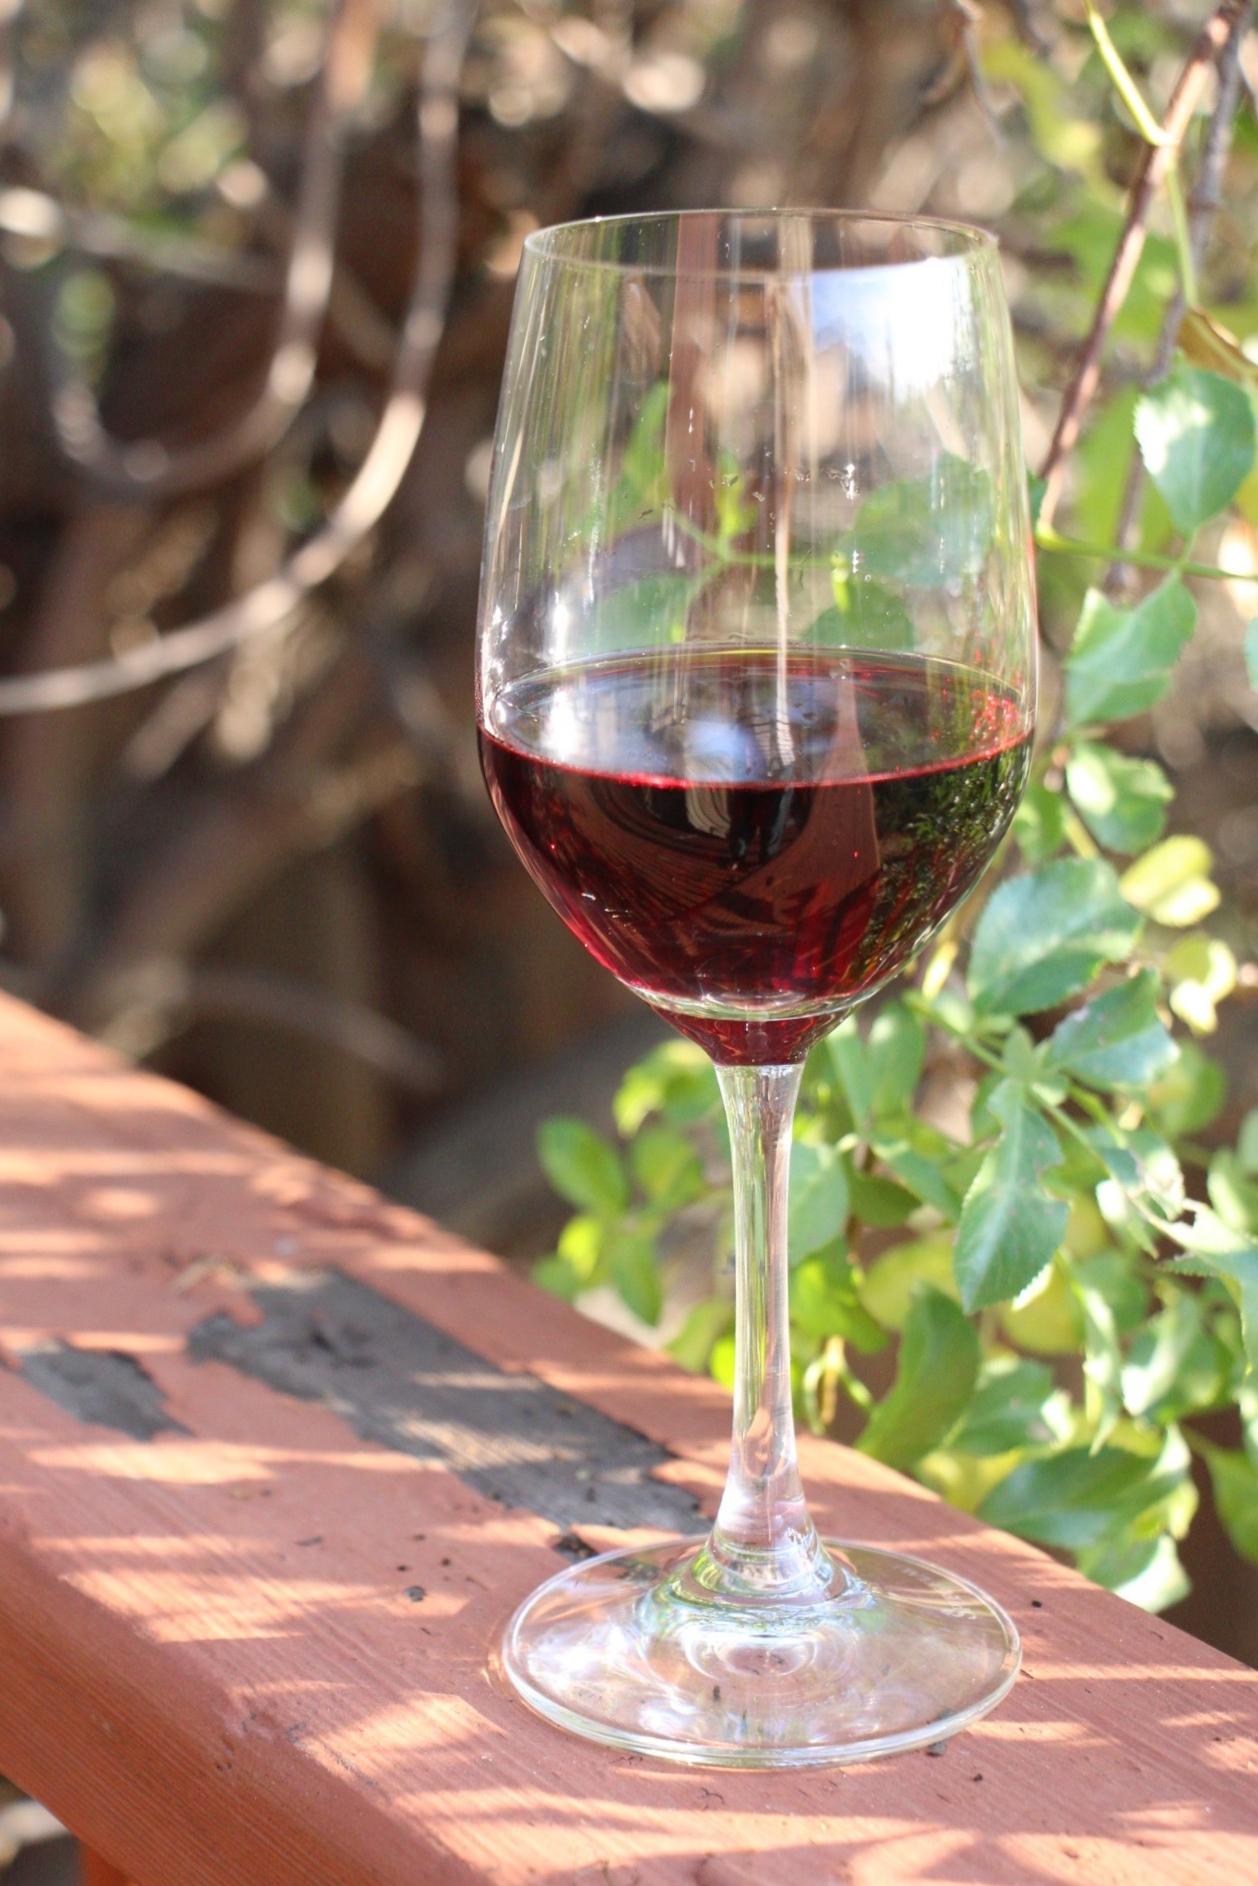 trader joe's wine review bargain wine cheap fort cellars merlot 2012